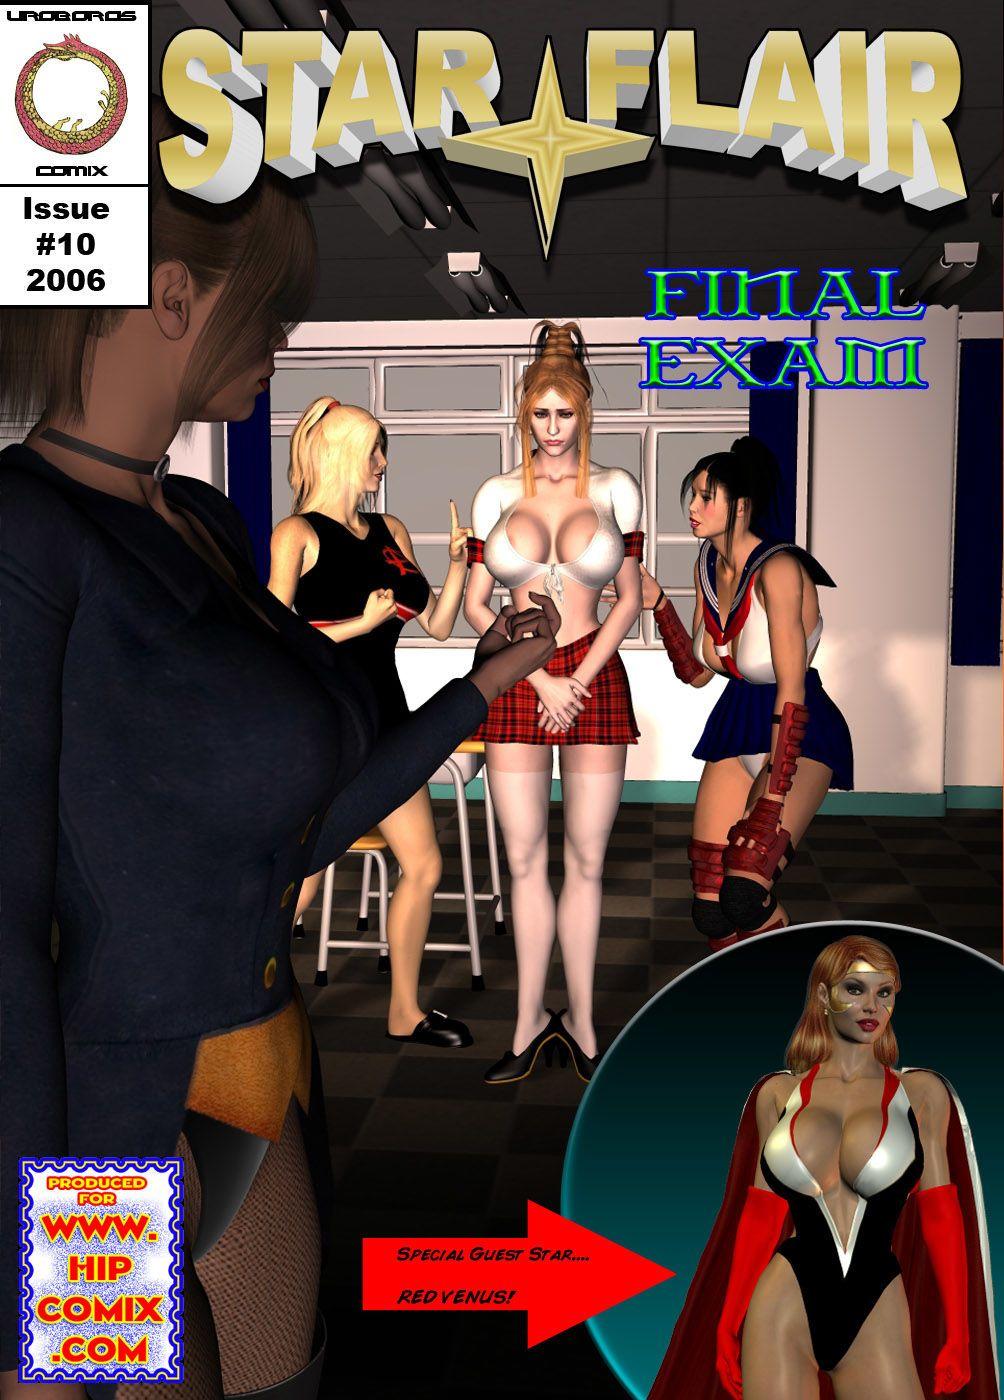 Star Flair 10